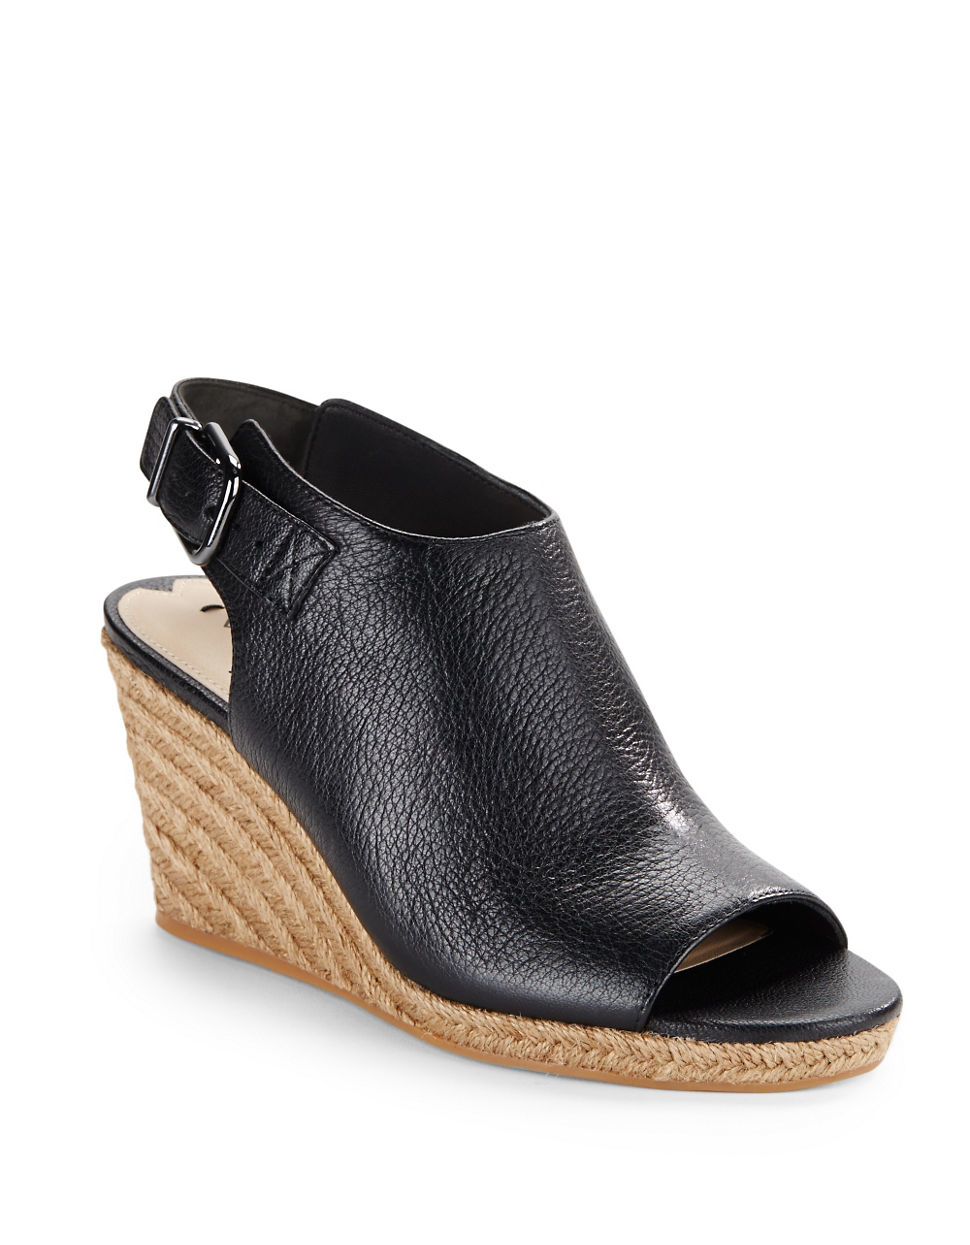 via spiga open toe espadrilles wedge sandals in black lyst